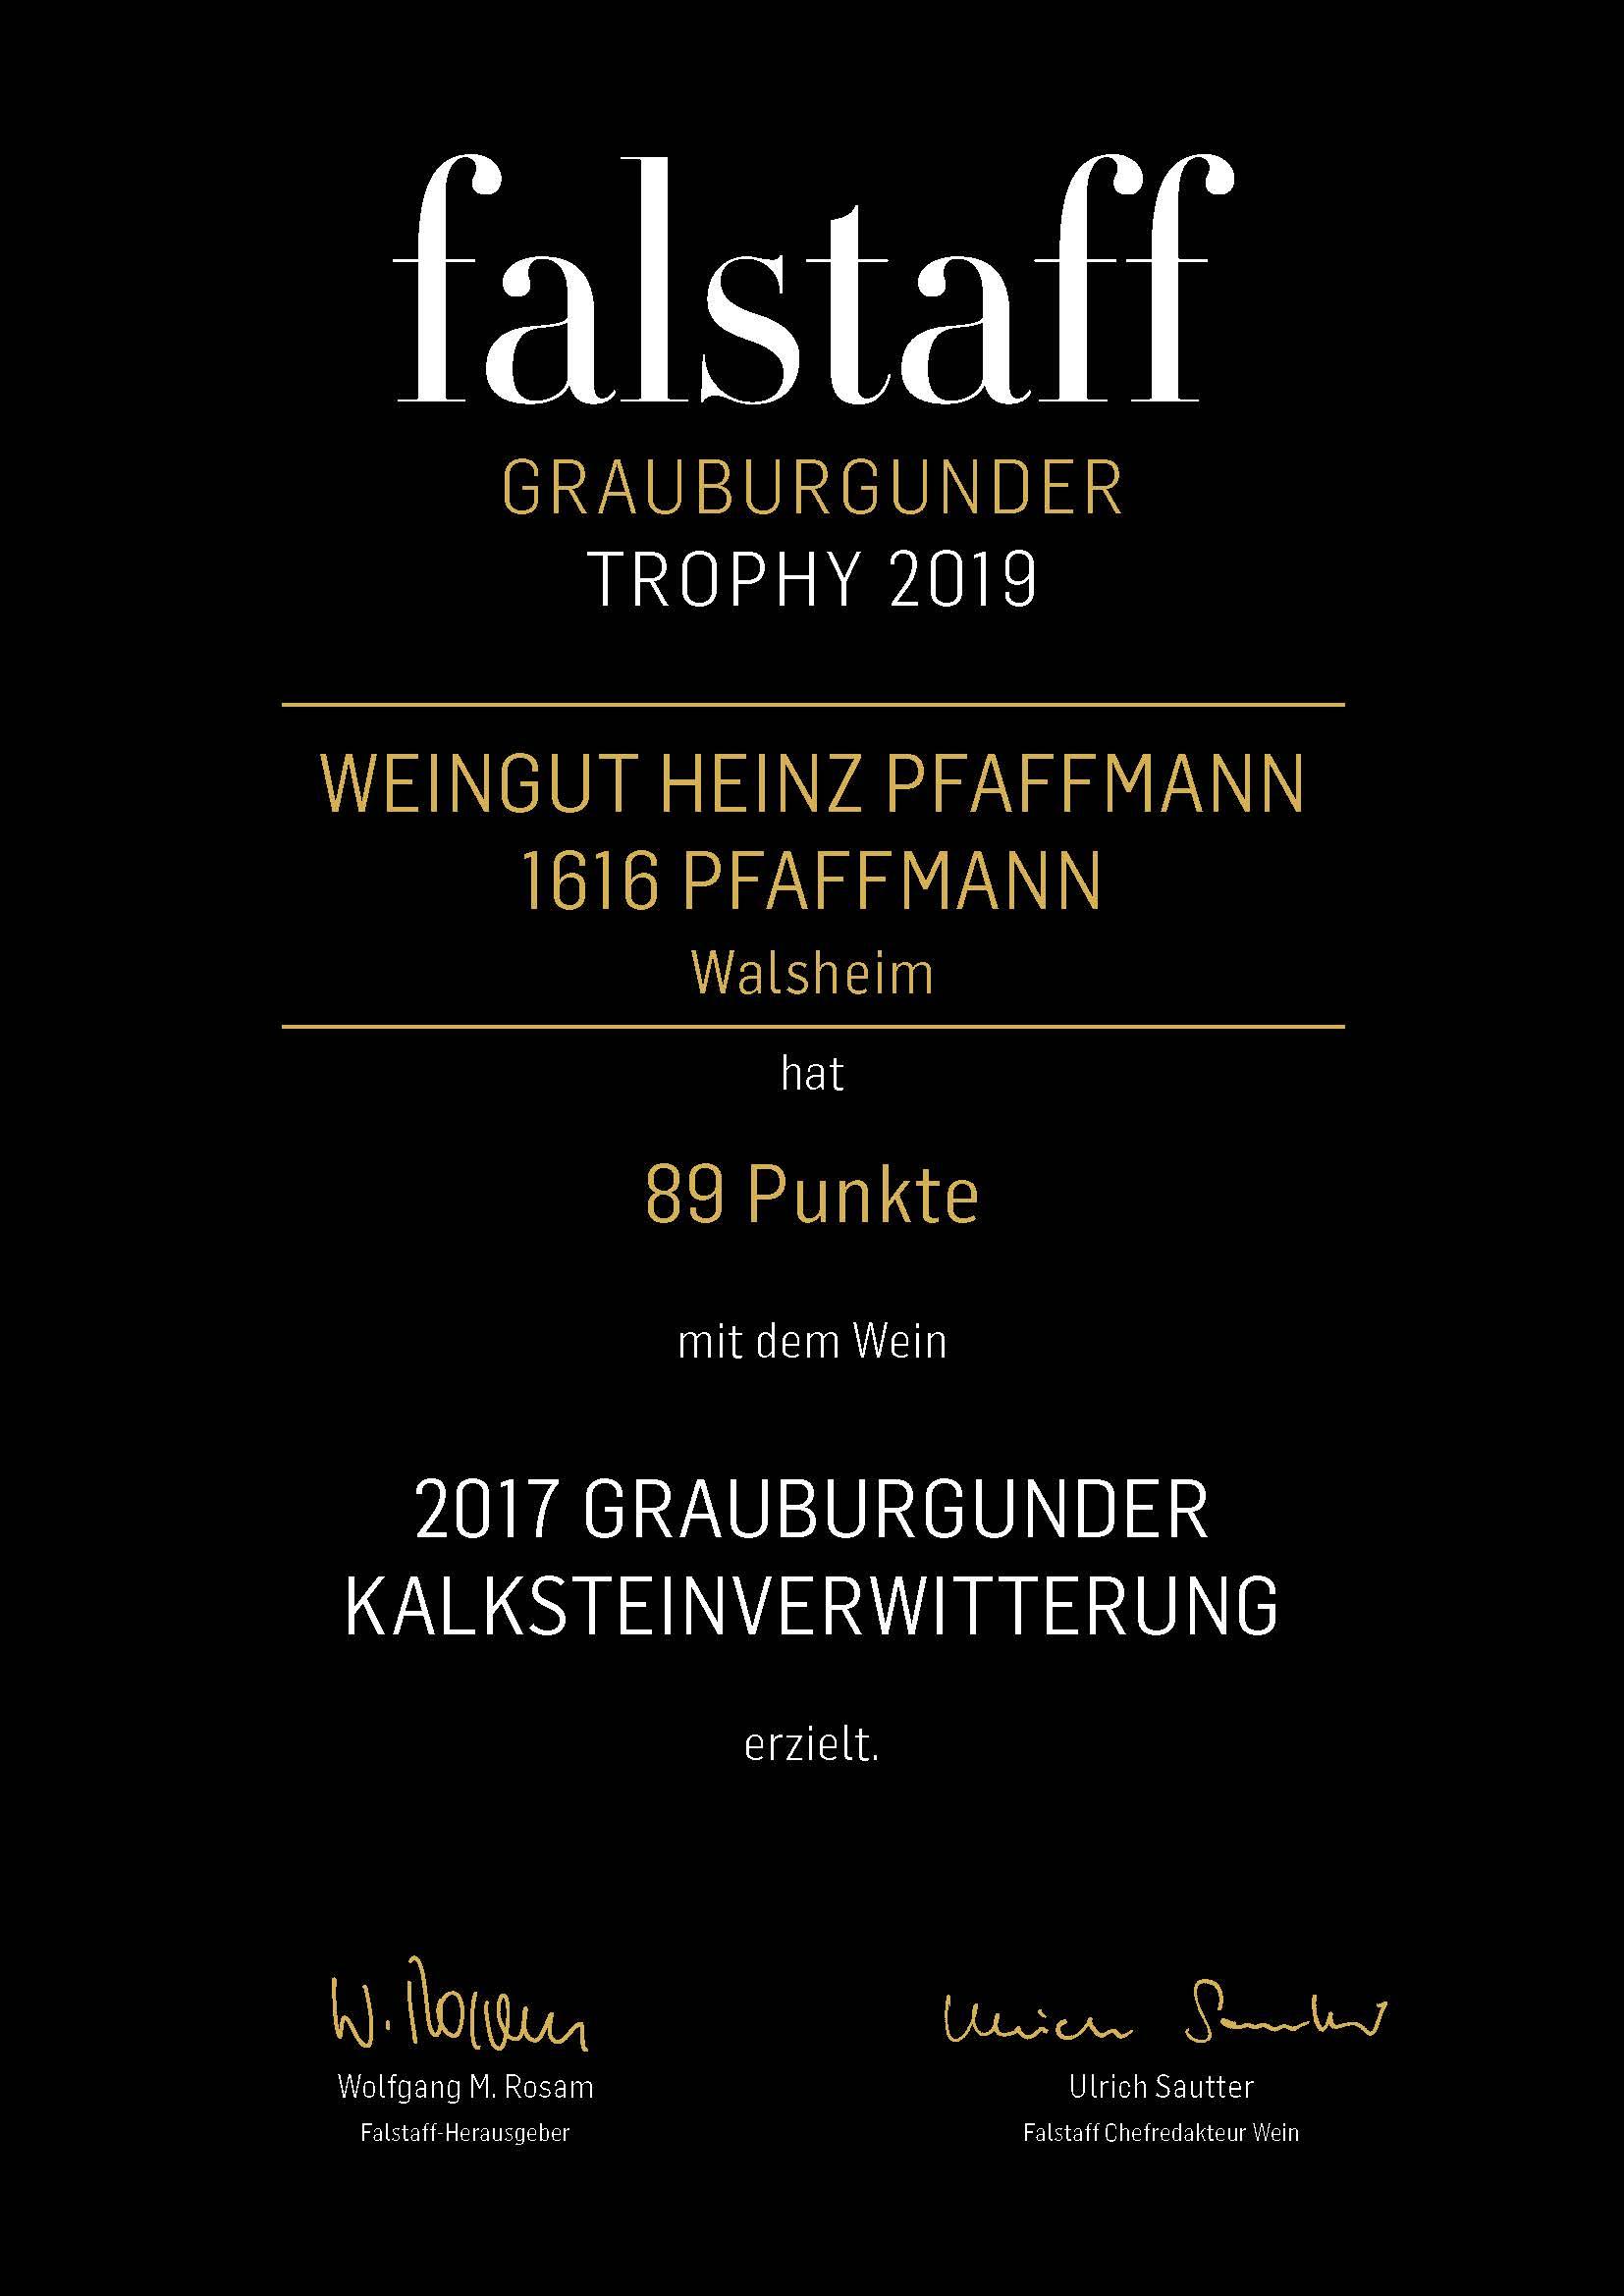 Falstaff Grauburgunder Trophy